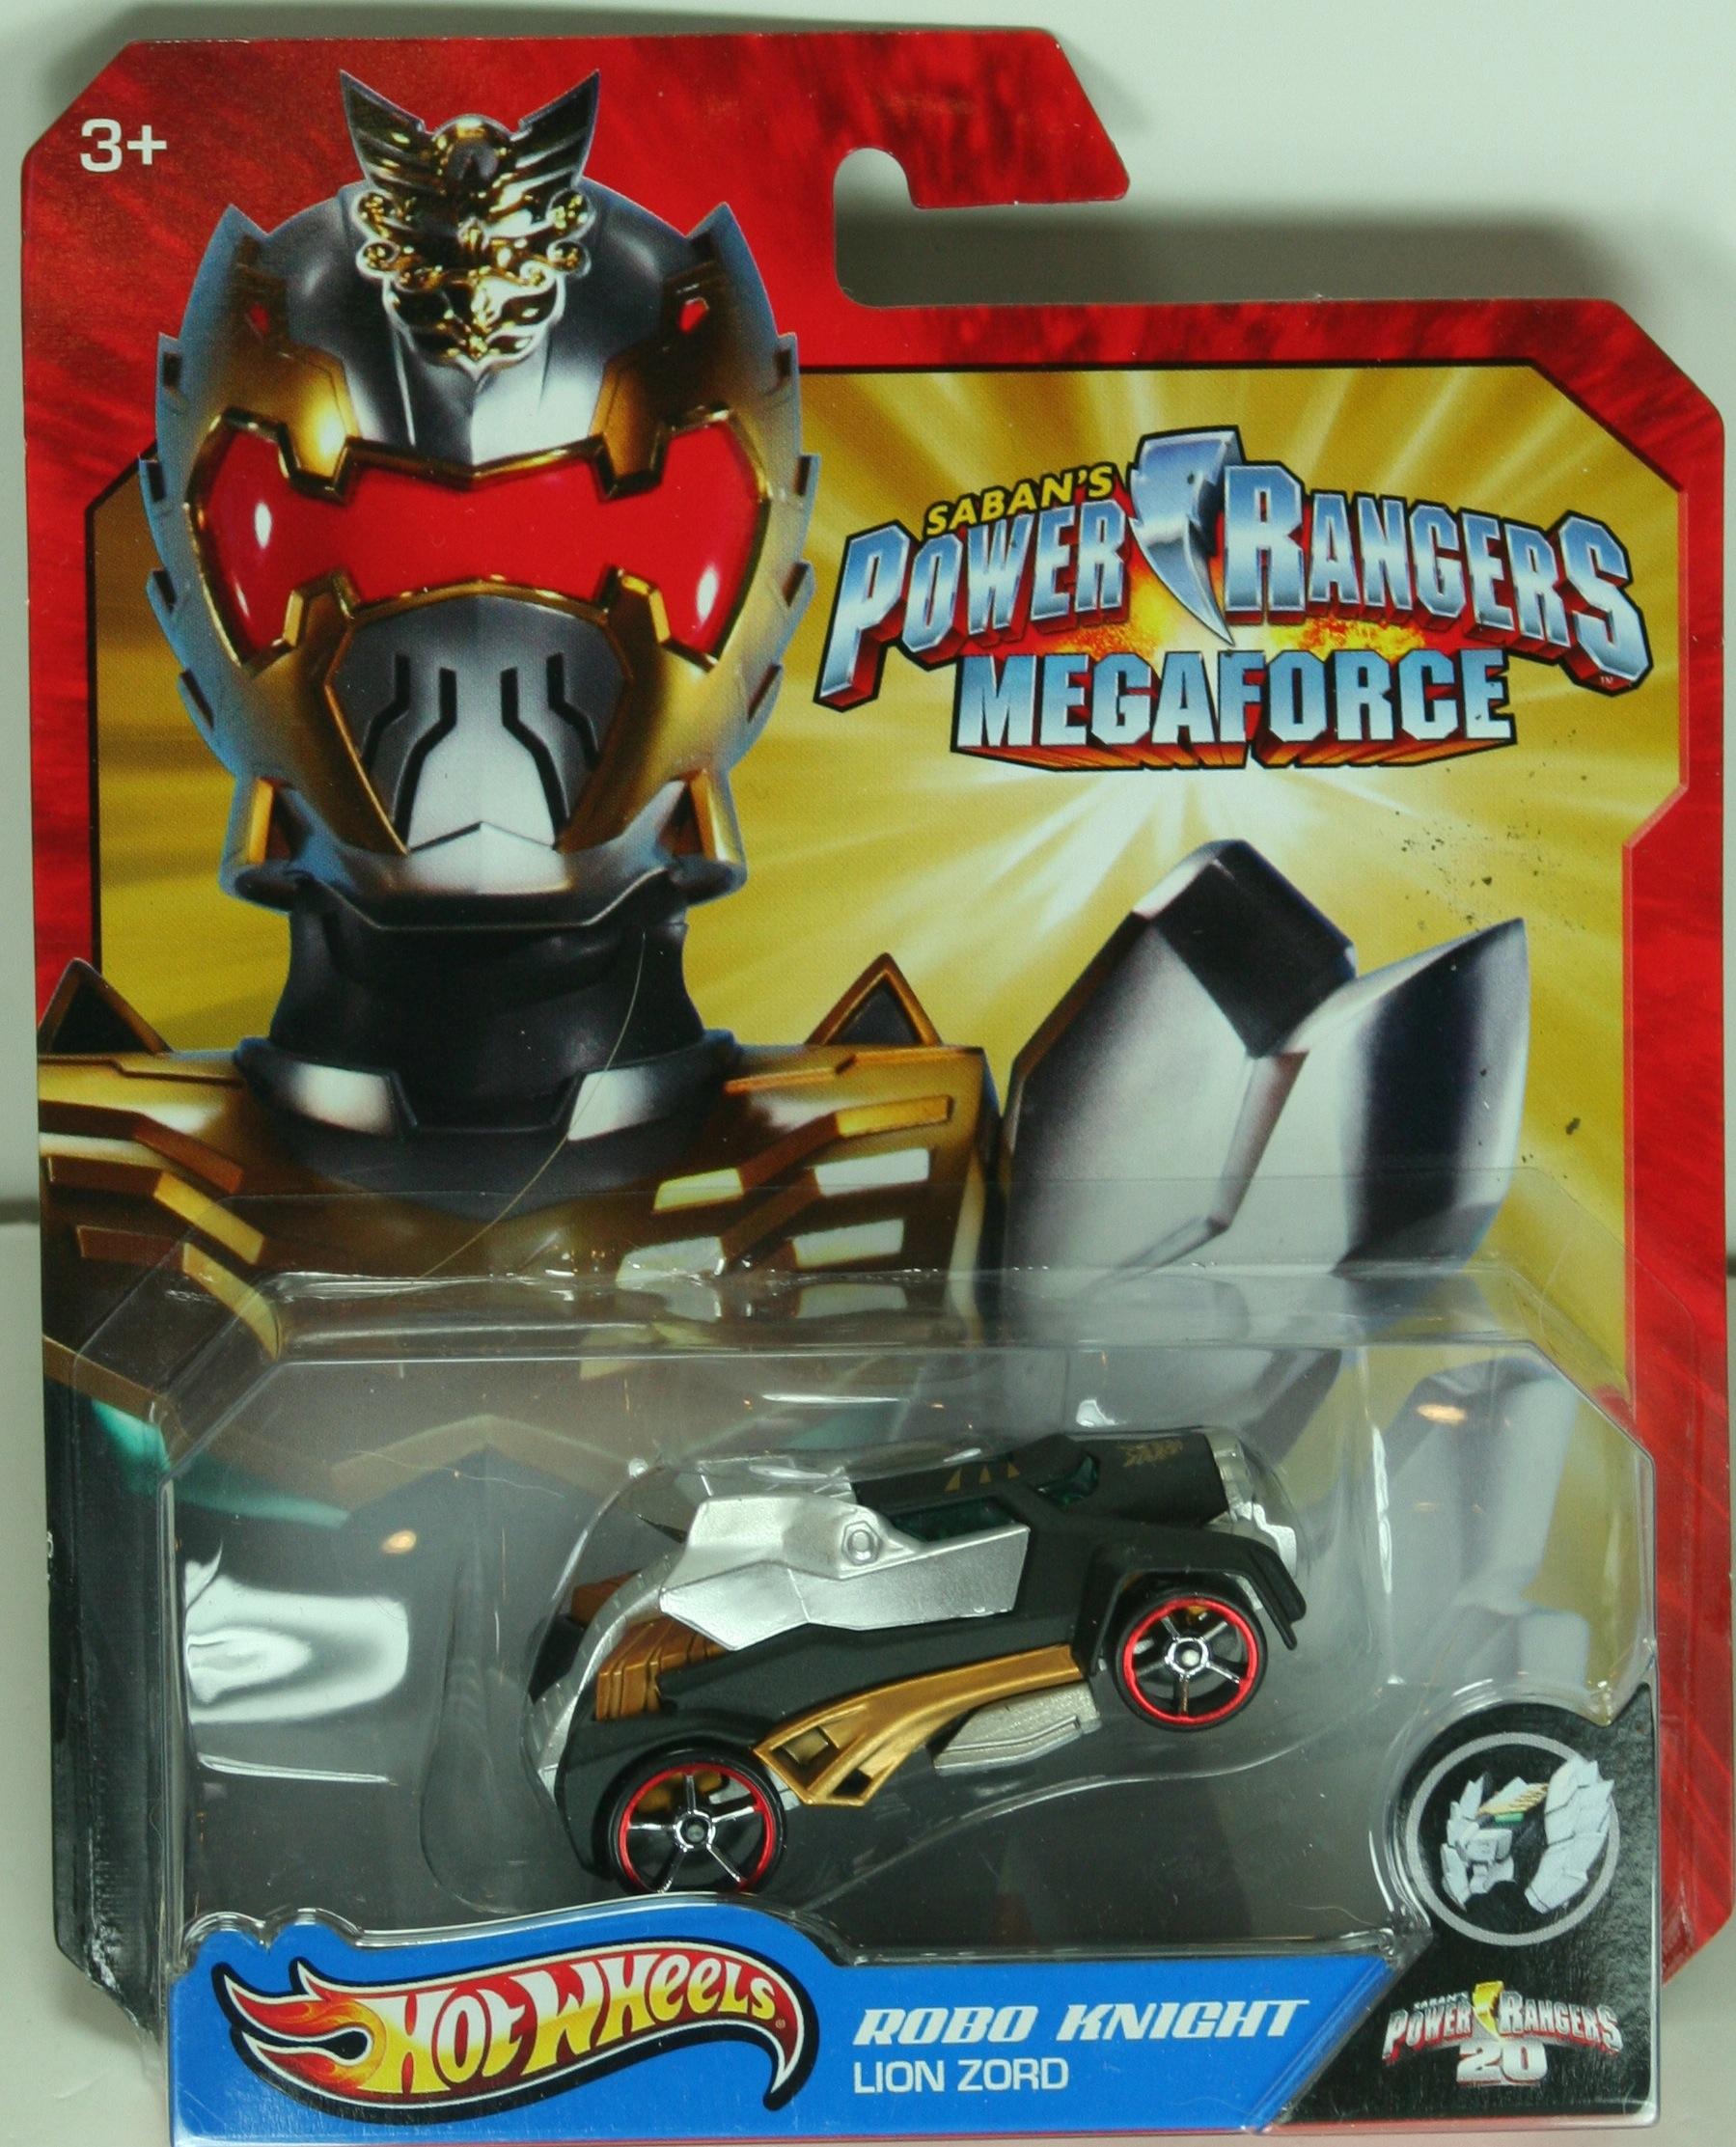 Image - 2013-PowerRangers-RoboKnight-Carded.jpg | Hot Wheels Wiki ...